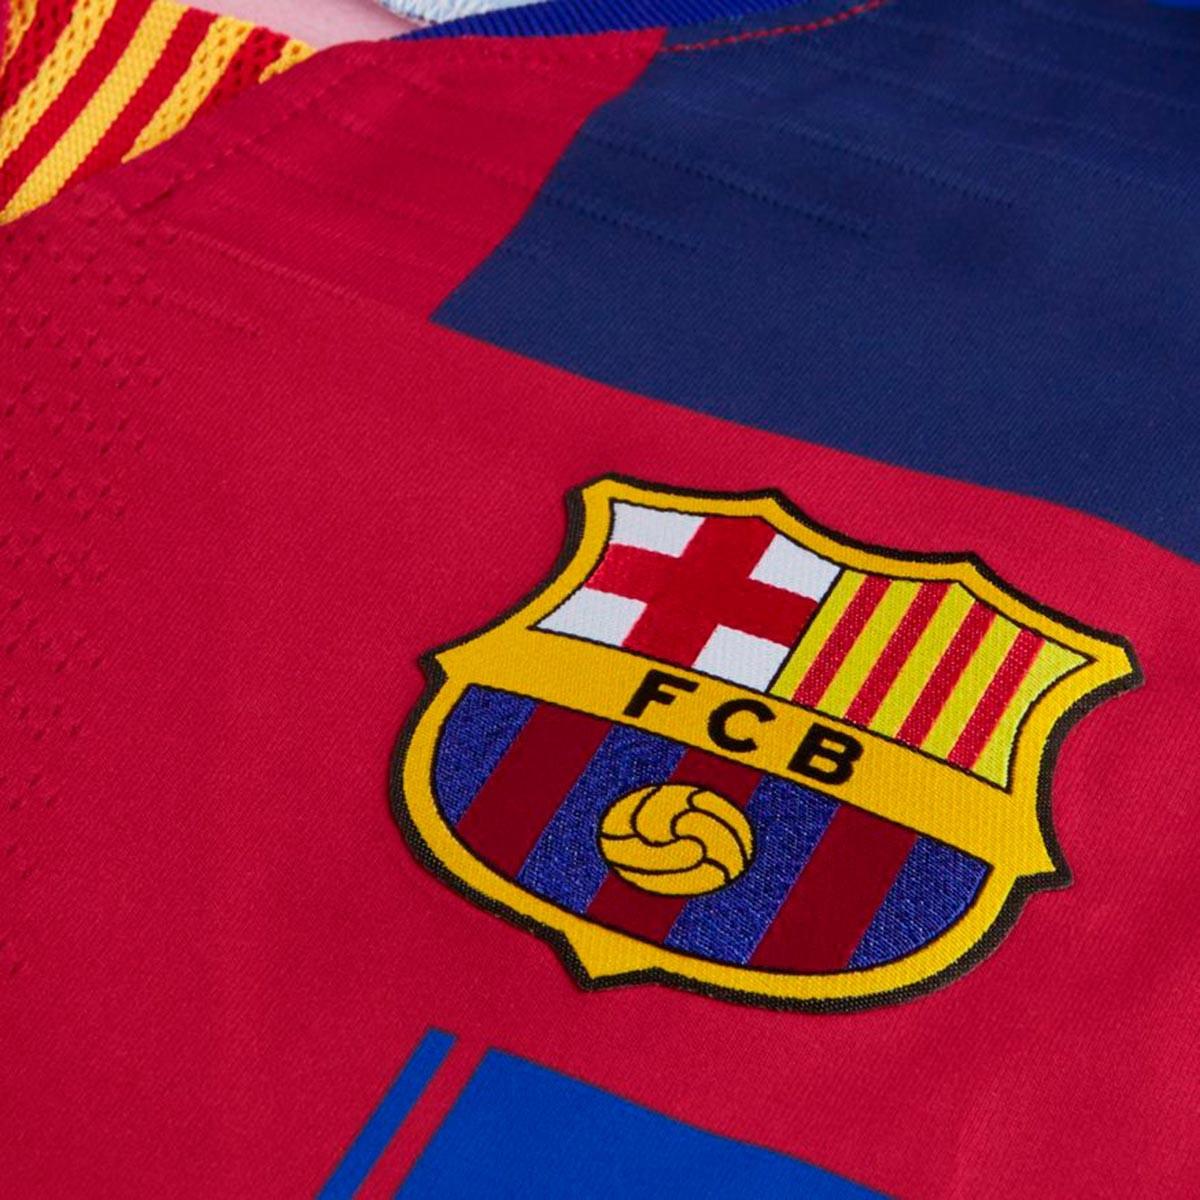 timeless design 433cf 37c03 Camiseta FC Barcelona Vapor Match 20 years Deep royal blue-Noble red-Tour  yellow